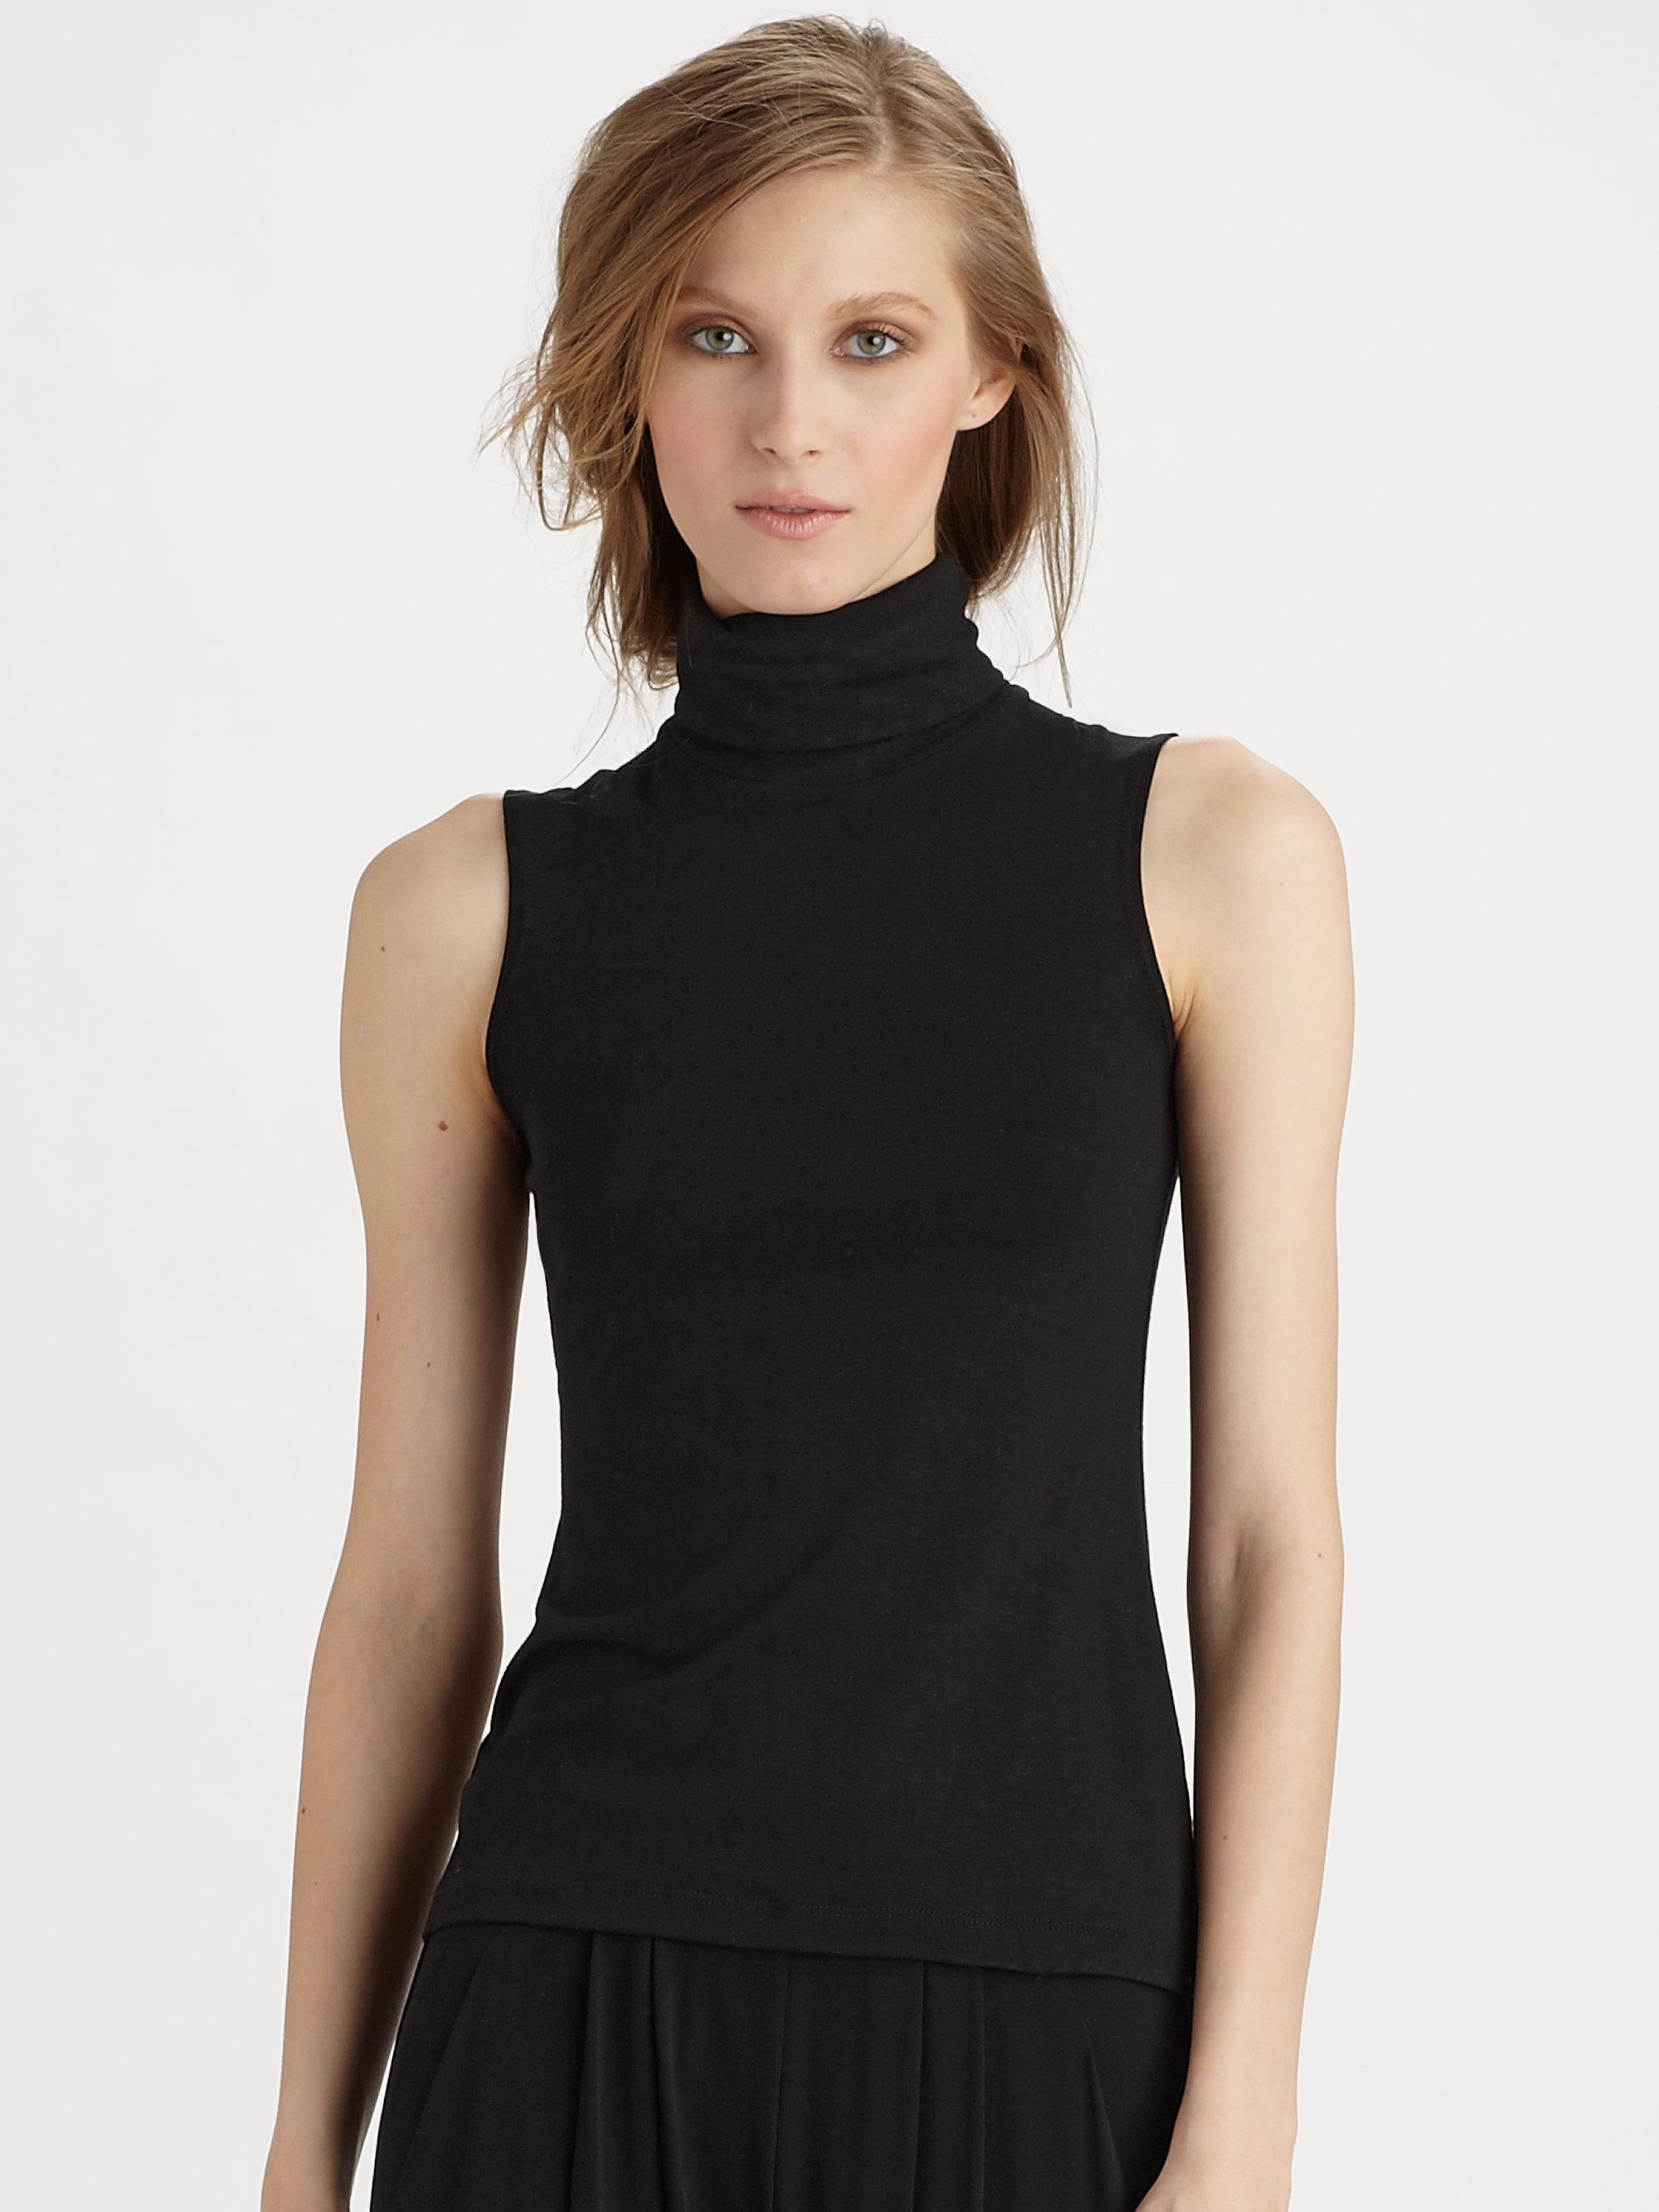 522ac378d0 Lyst - Donna Karan Sleeveless Turtleneck Top in Black